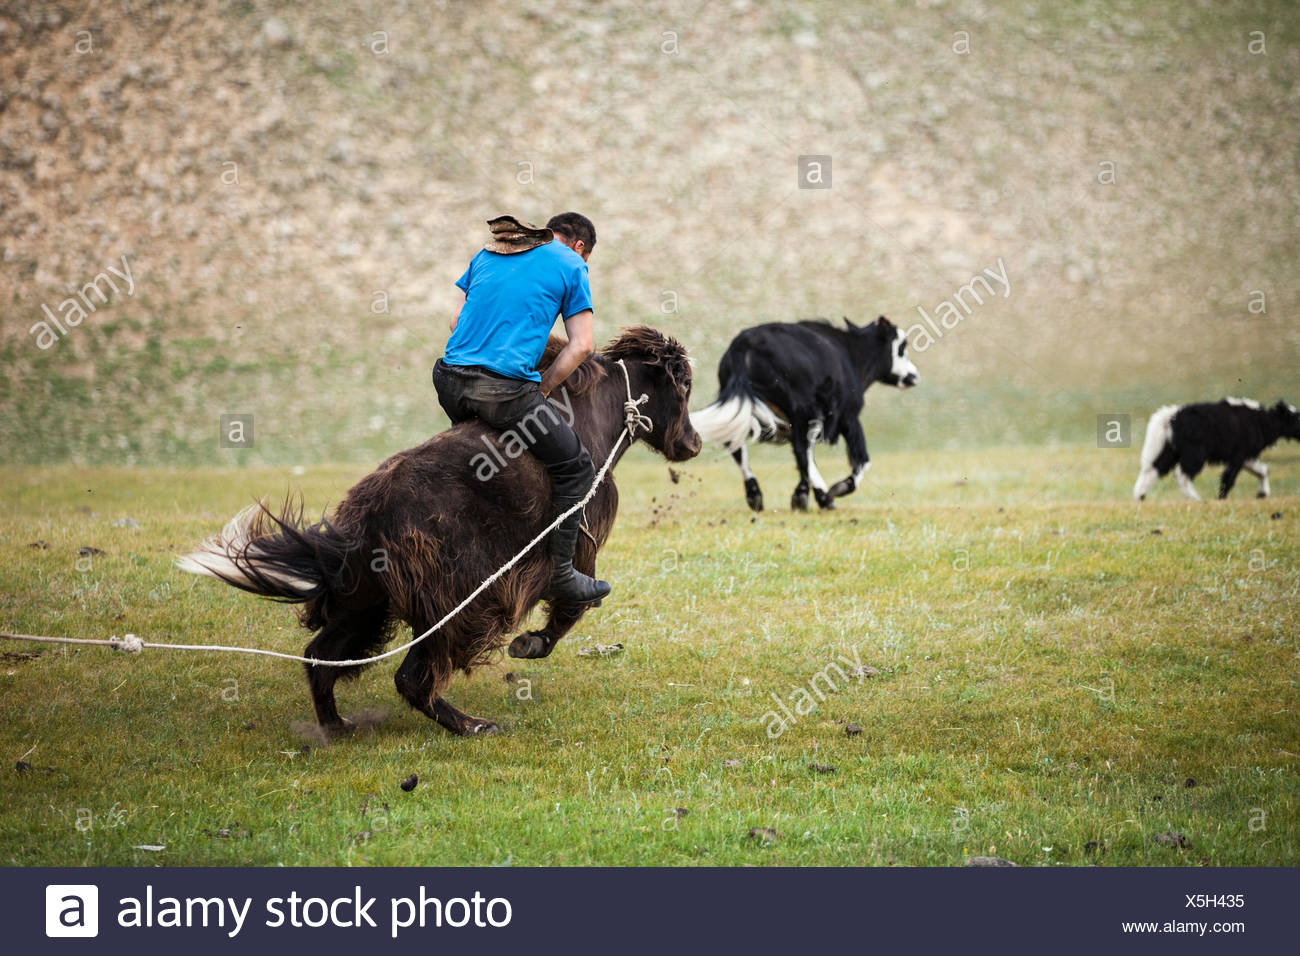 Man riding yak bronco, Bulgan, Central Mongolia, Mongolia - Stock Image